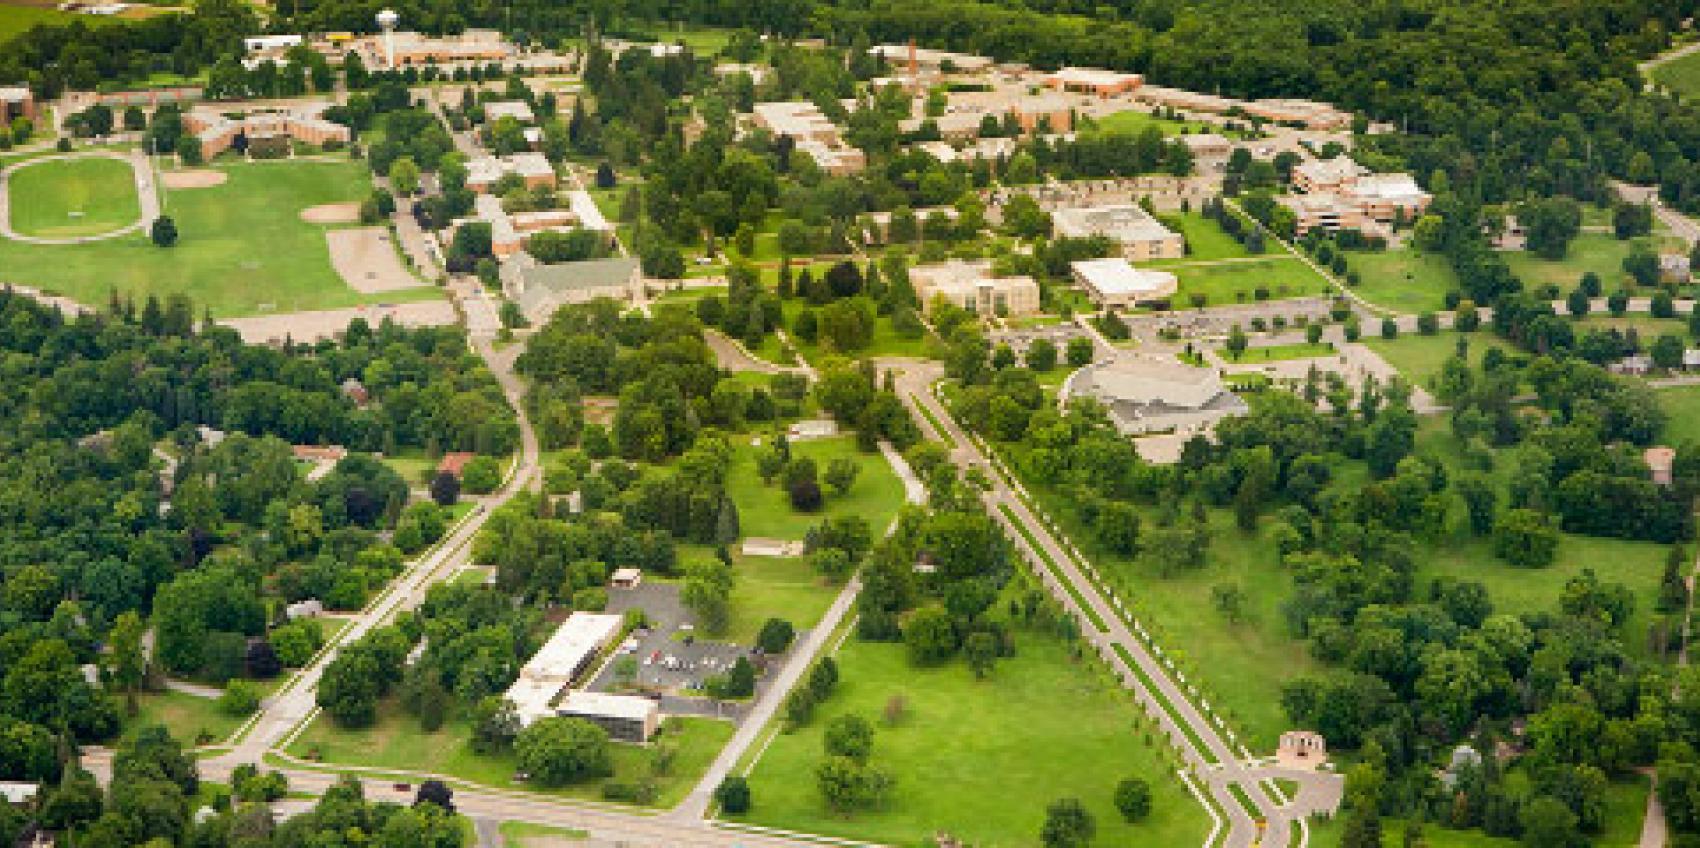 Andrews university arboretum american public gardens for American garden association